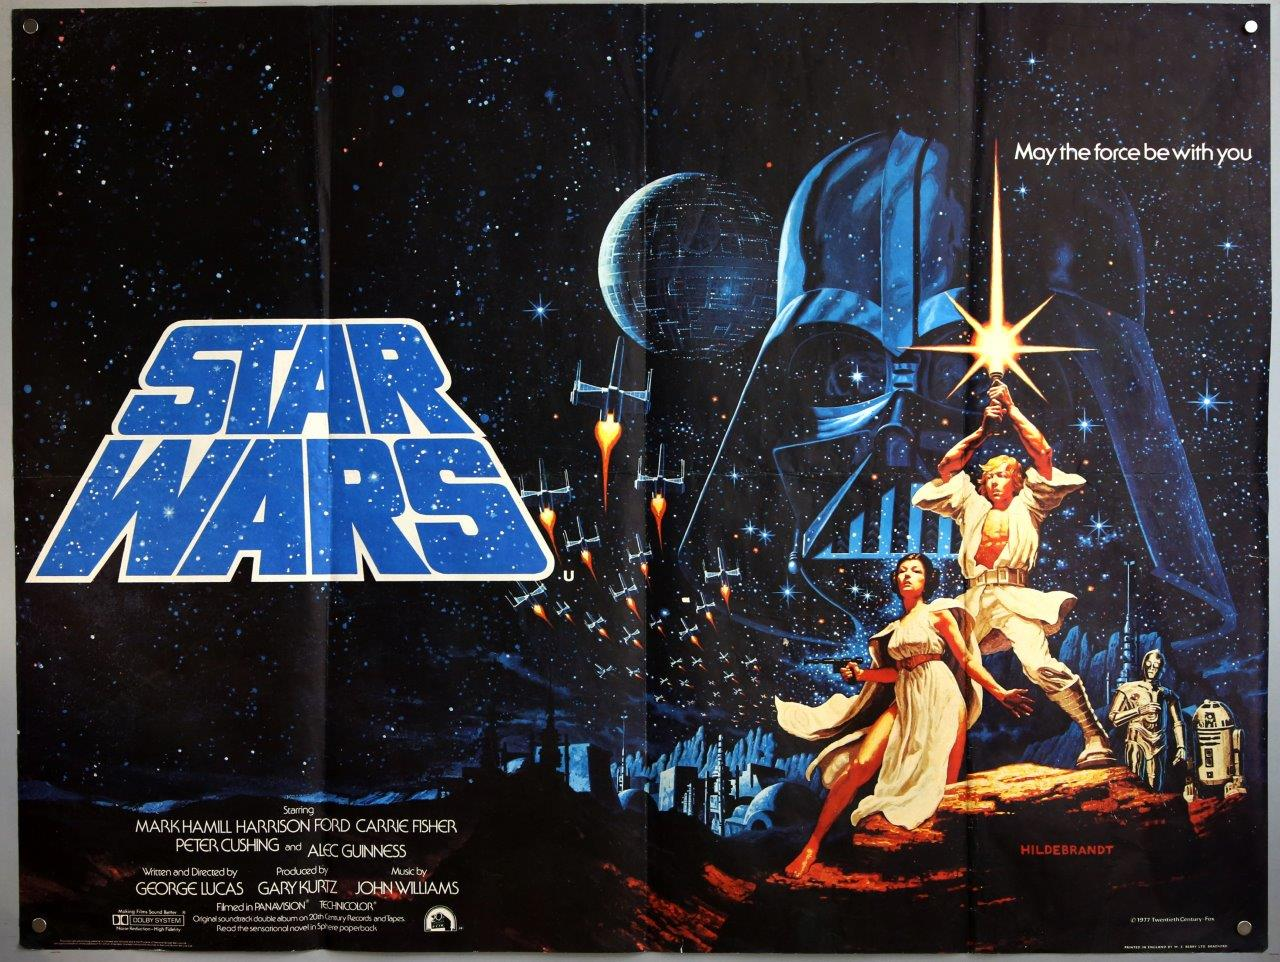 Rare Star Wars Posters On Sale At Ewbank's | News Blog